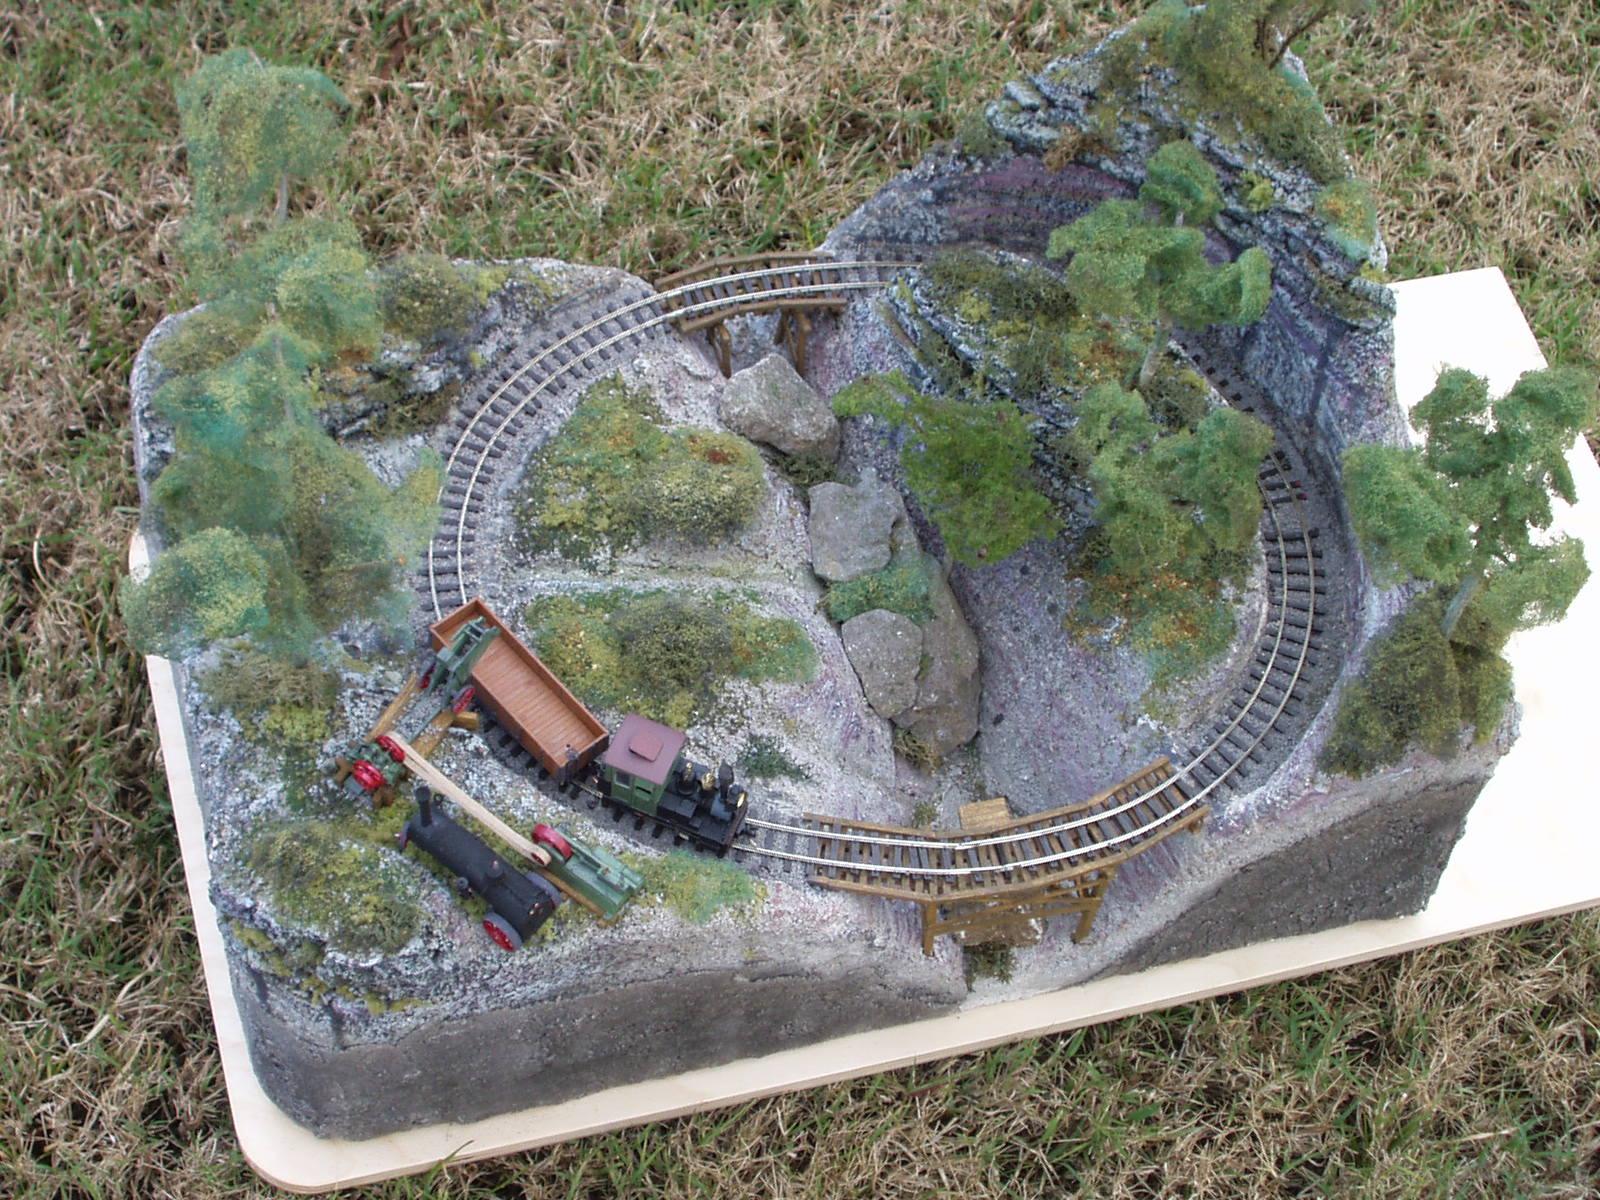 Bens Train Hobby: Micro model train layouts